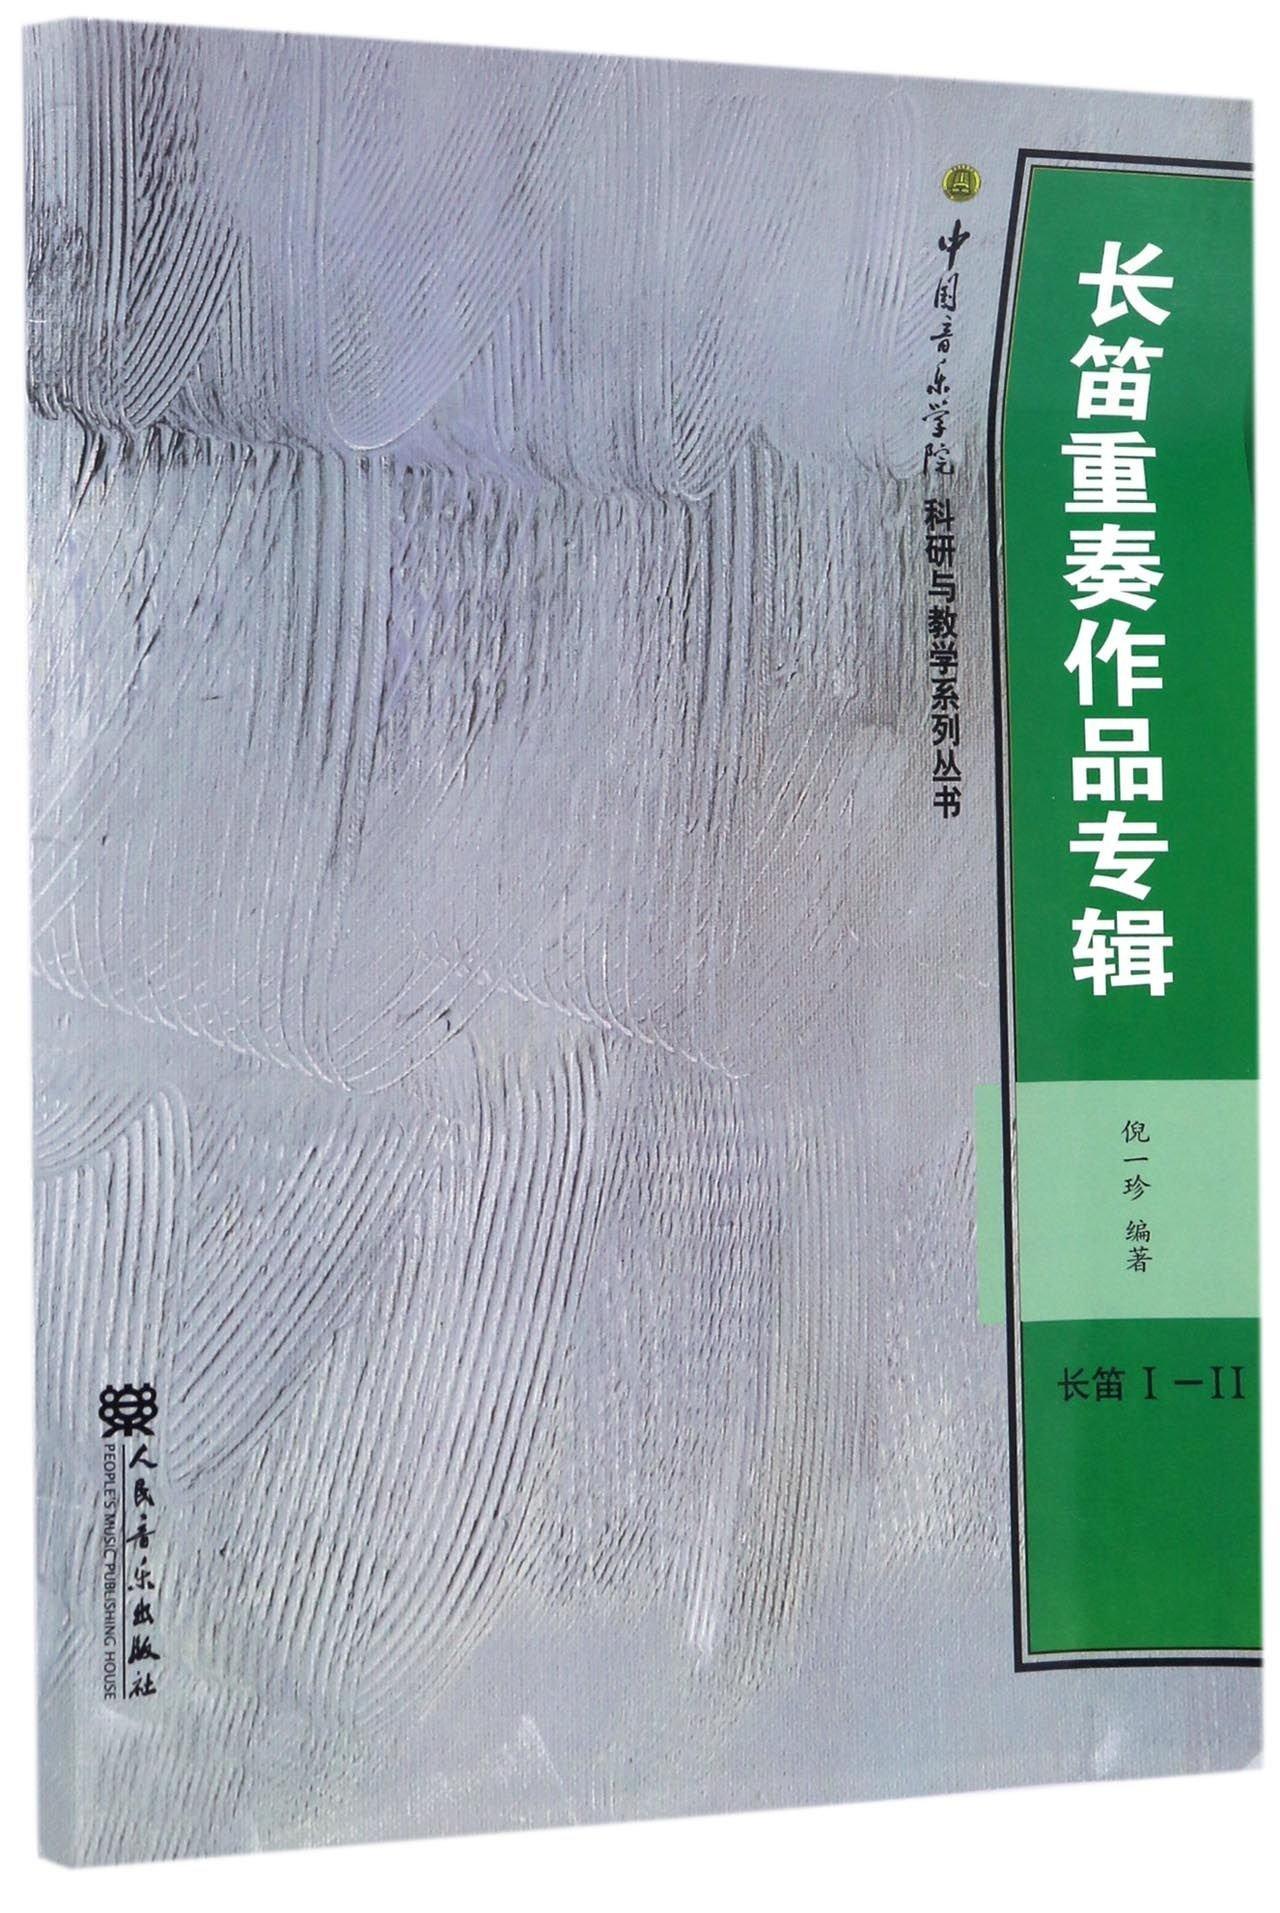 Download 长笛重奏作品专辑(附光盘共2册)/中国音乐学院科研与教学系列丛书 ebook